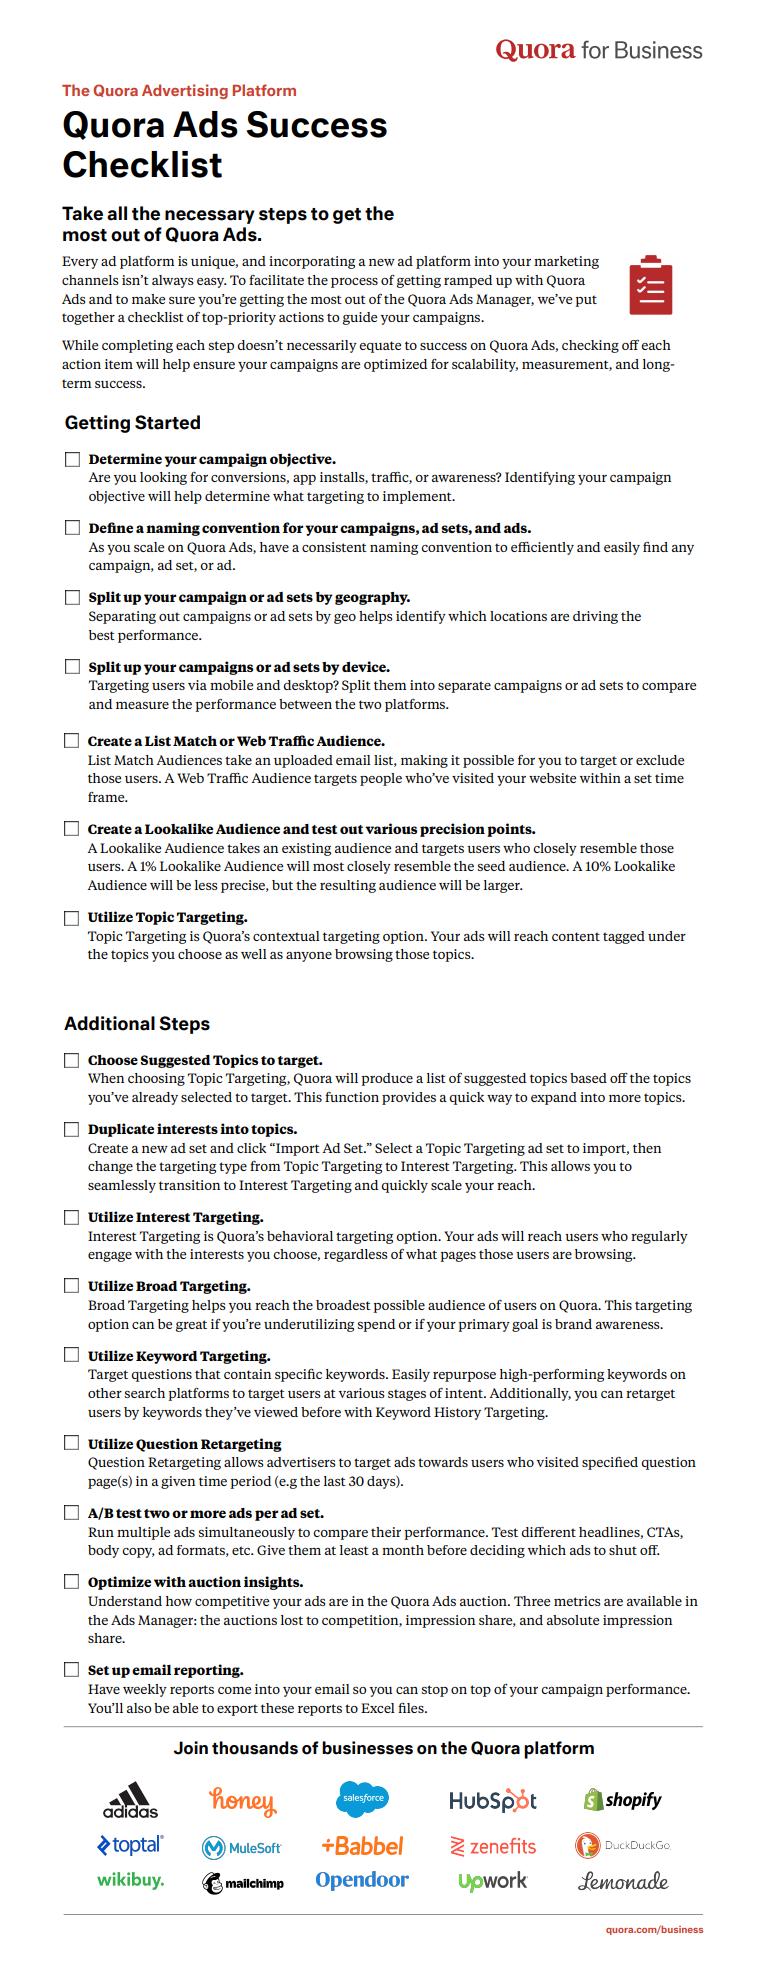 Quora ads checklist